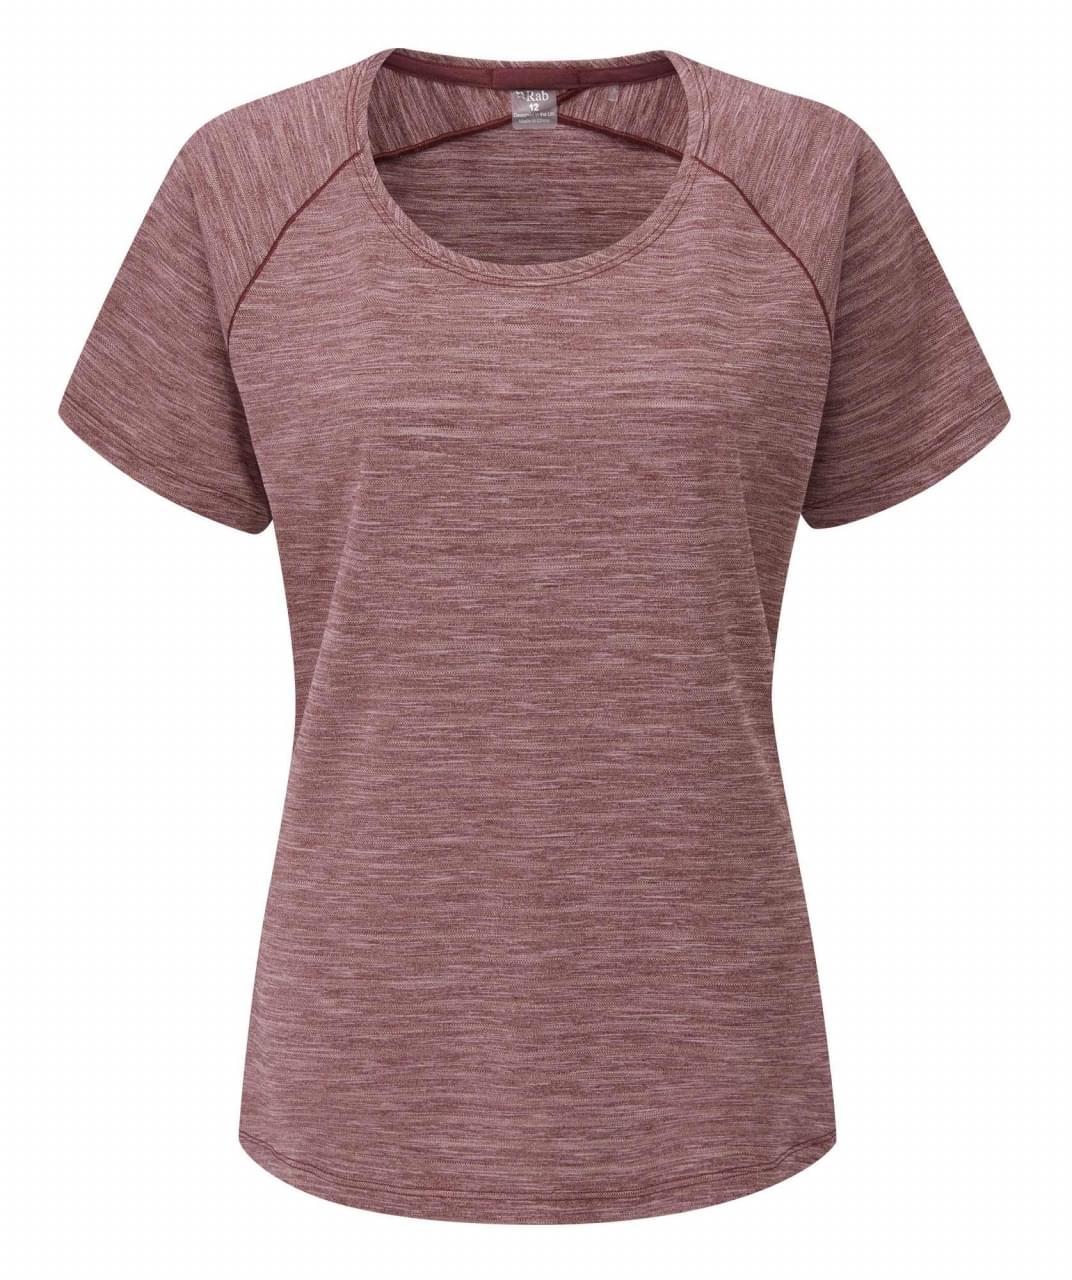 RAB Wisp T-Shirt Dames Rood